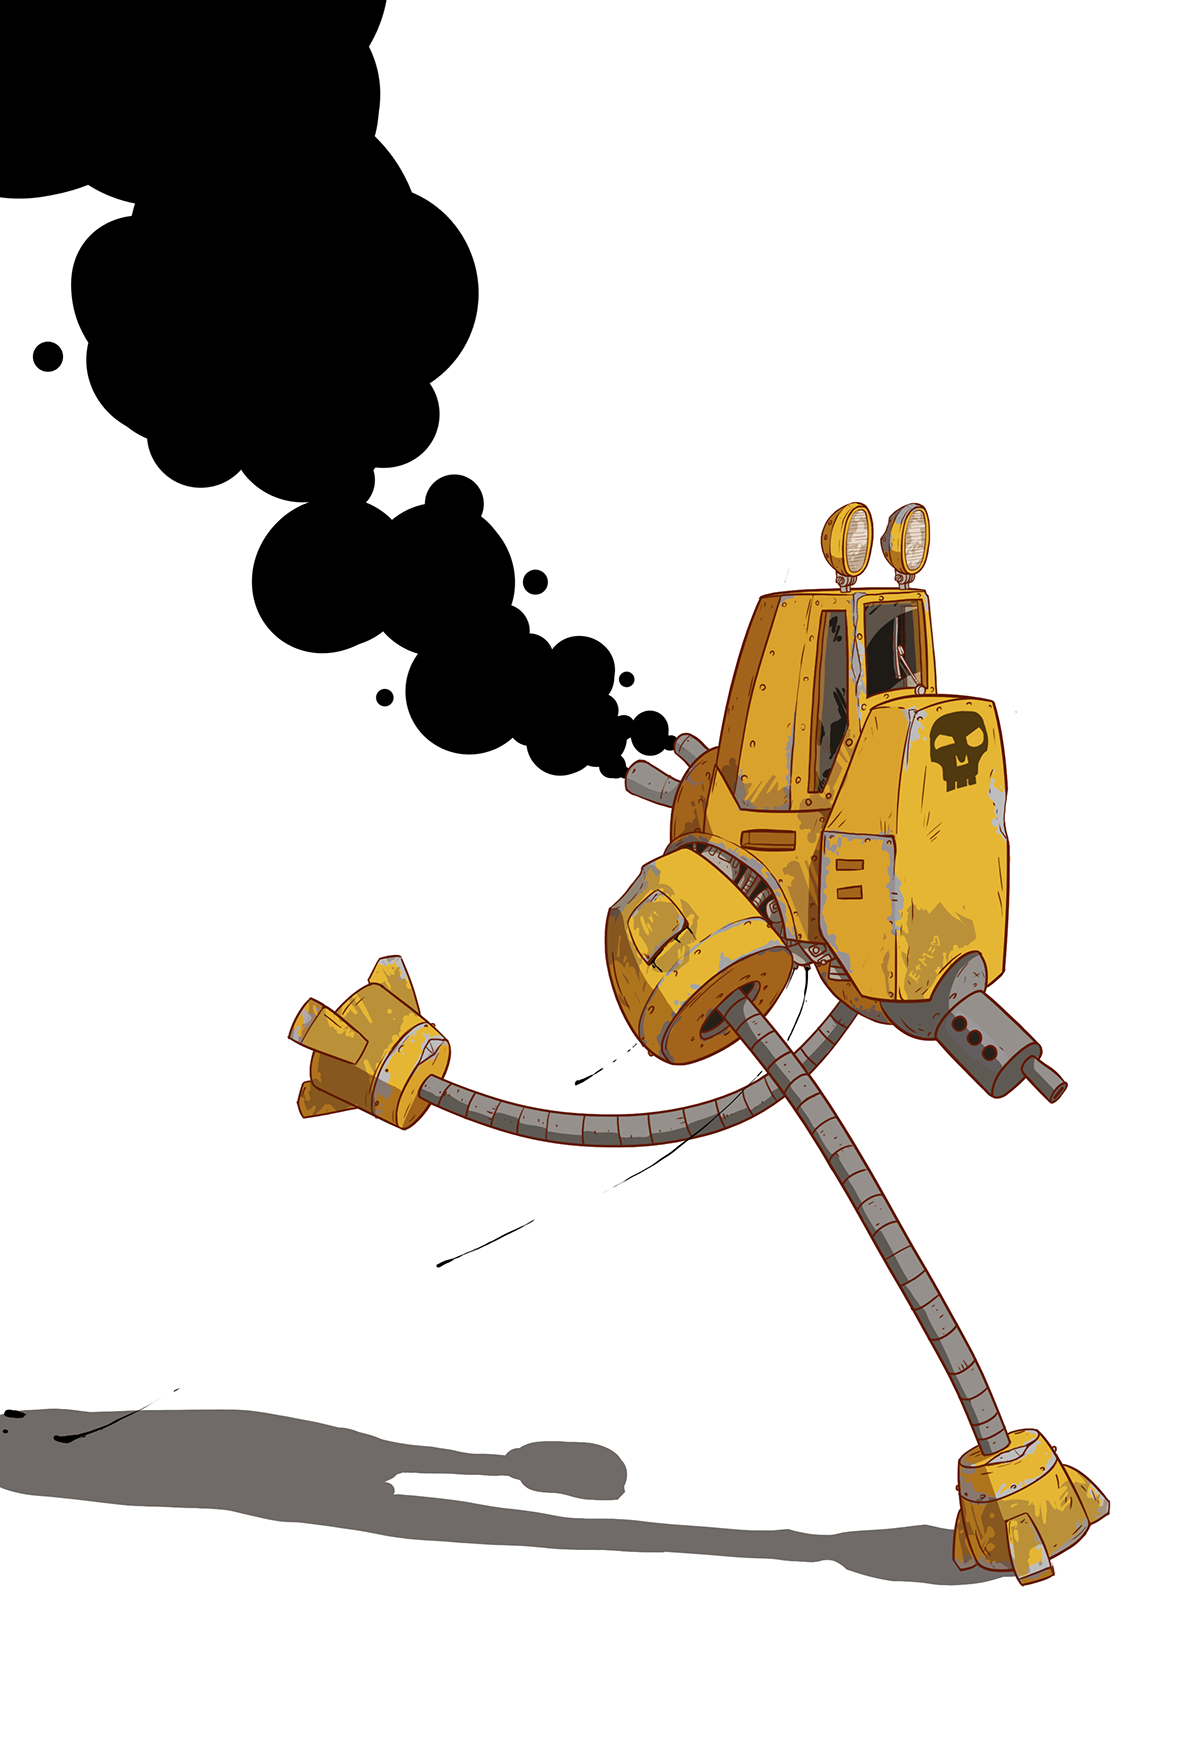 project Robot-Szhmobot